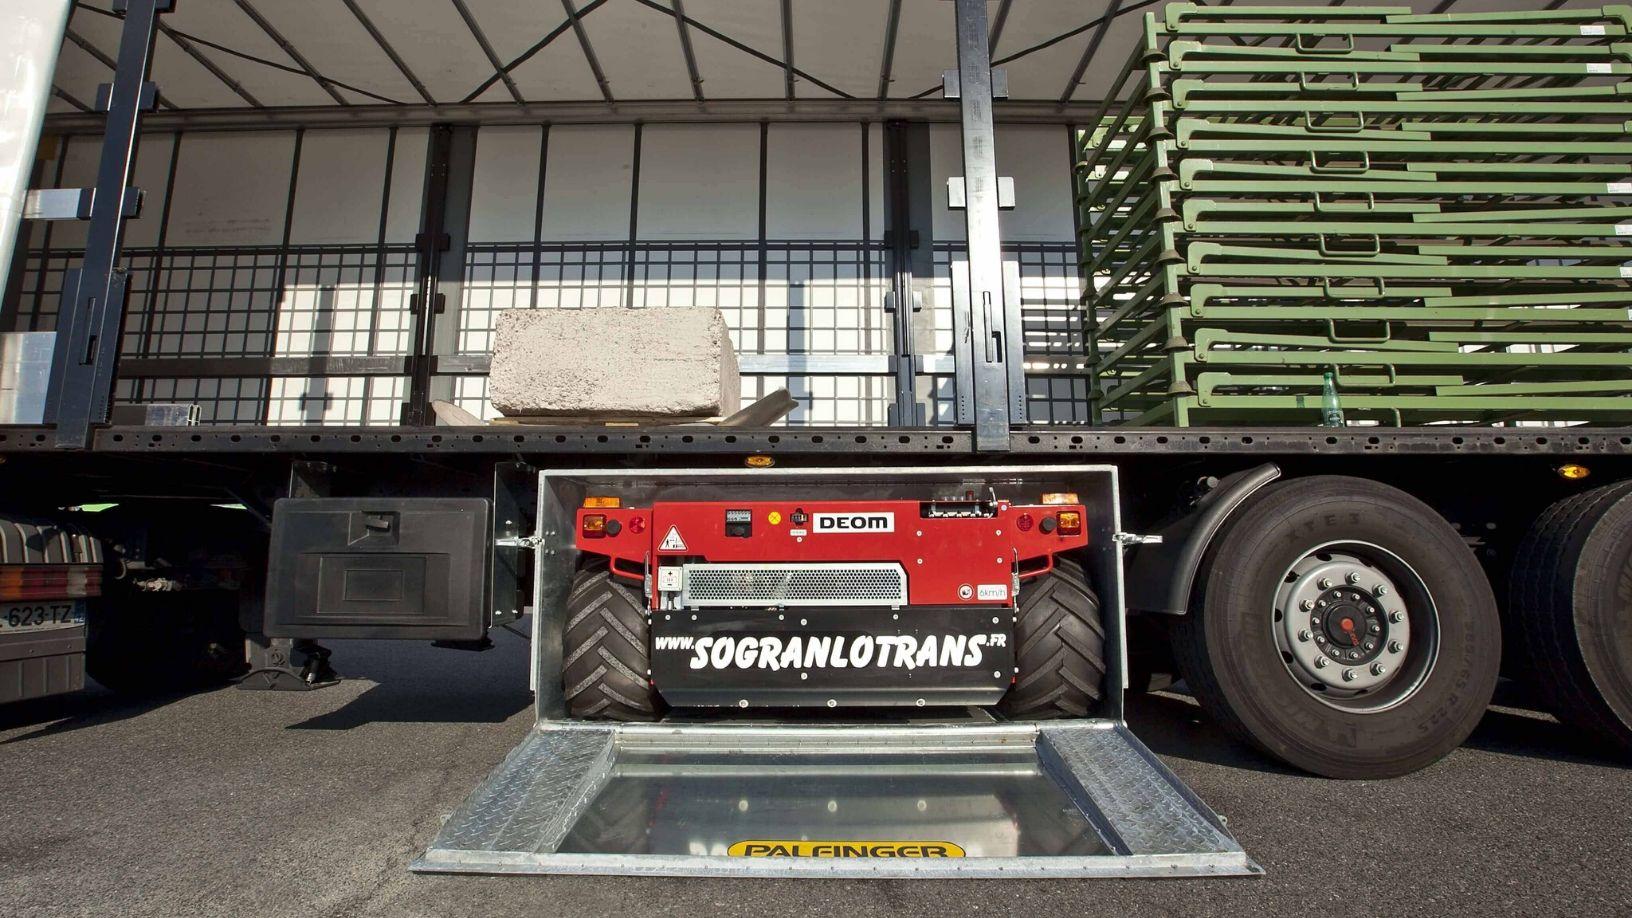 Sogranlotrans camion equipe chariot embarque telecommande